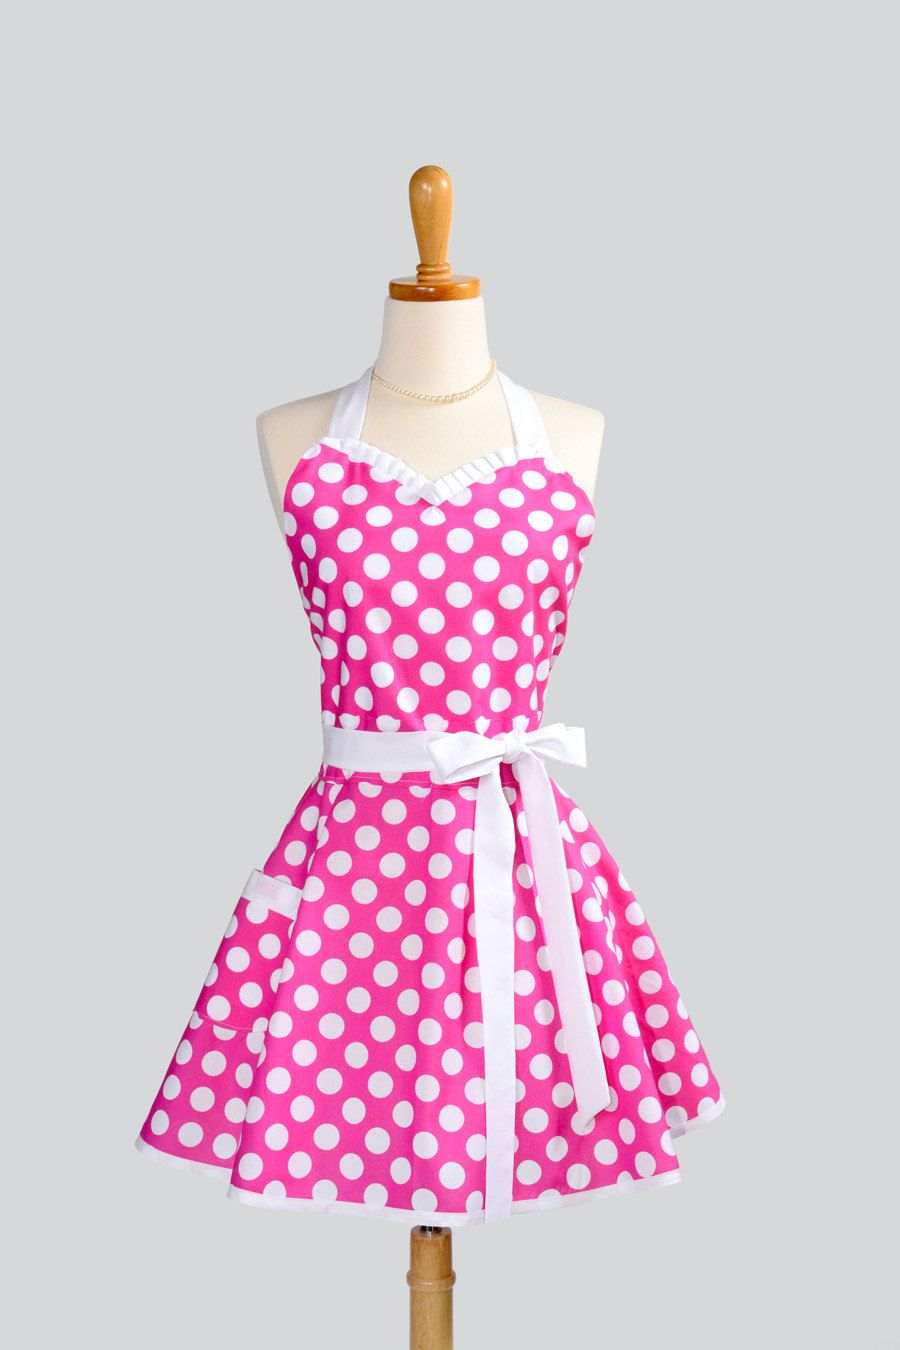 Womens Flirty Sweetheart Apron - Retro Pin-up Ruffles Hot Pink and ...